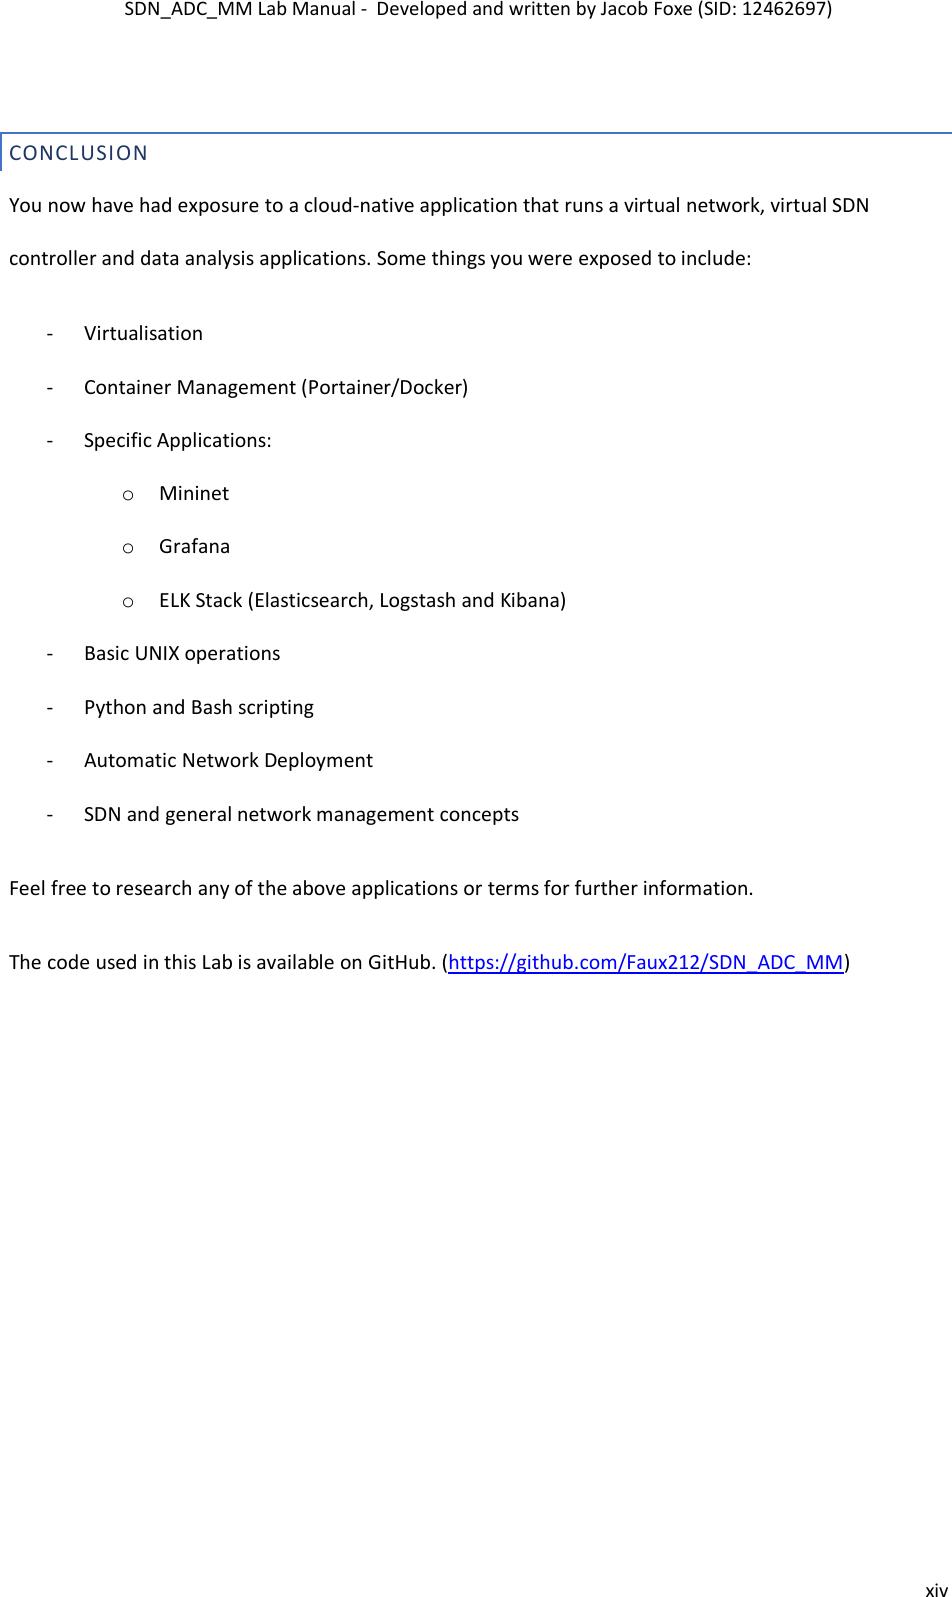 SDN ADC MM Manual